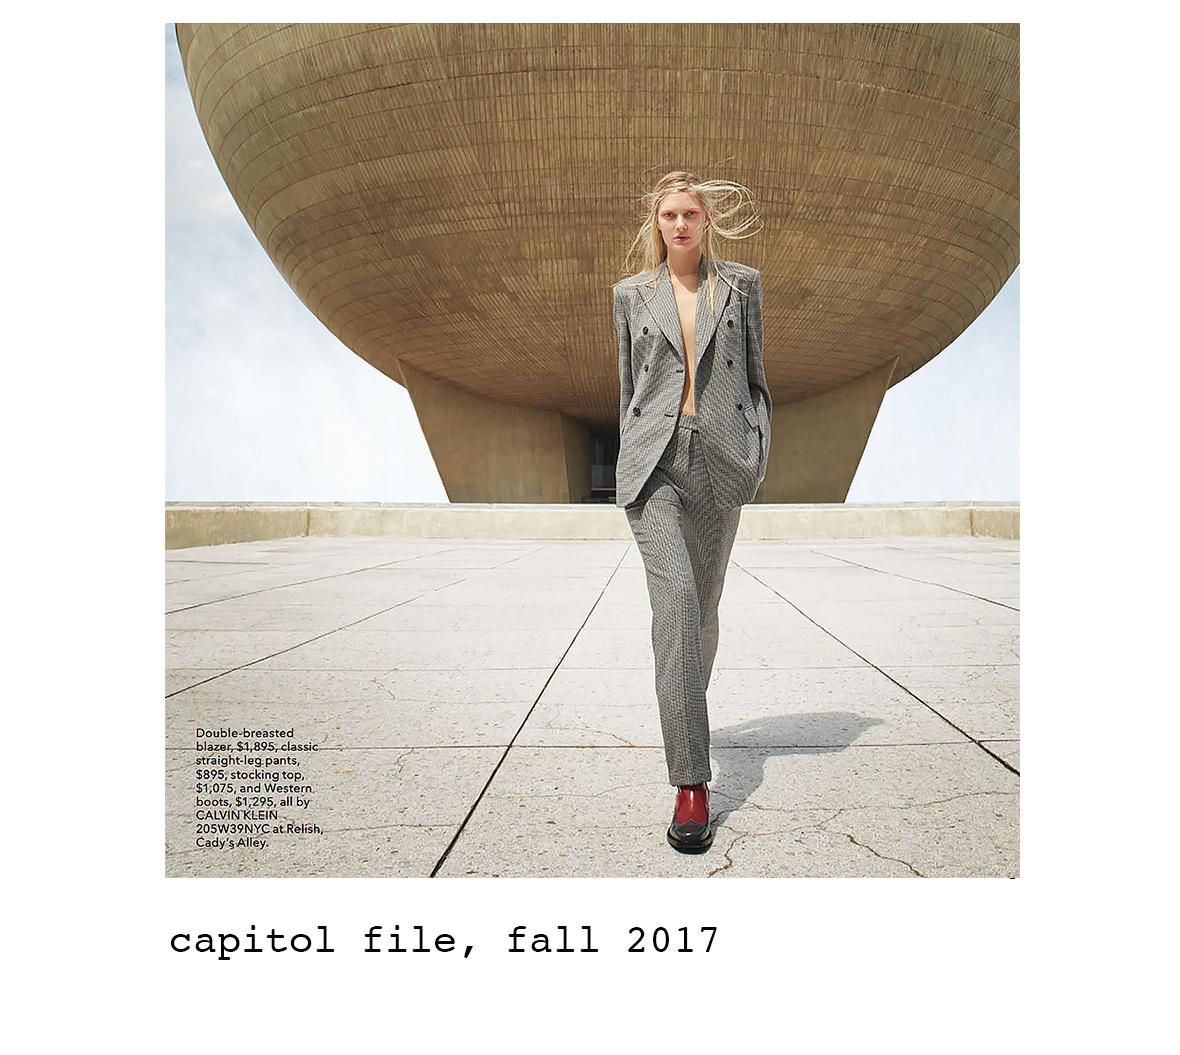 capitolfile_fall17_2.jpg